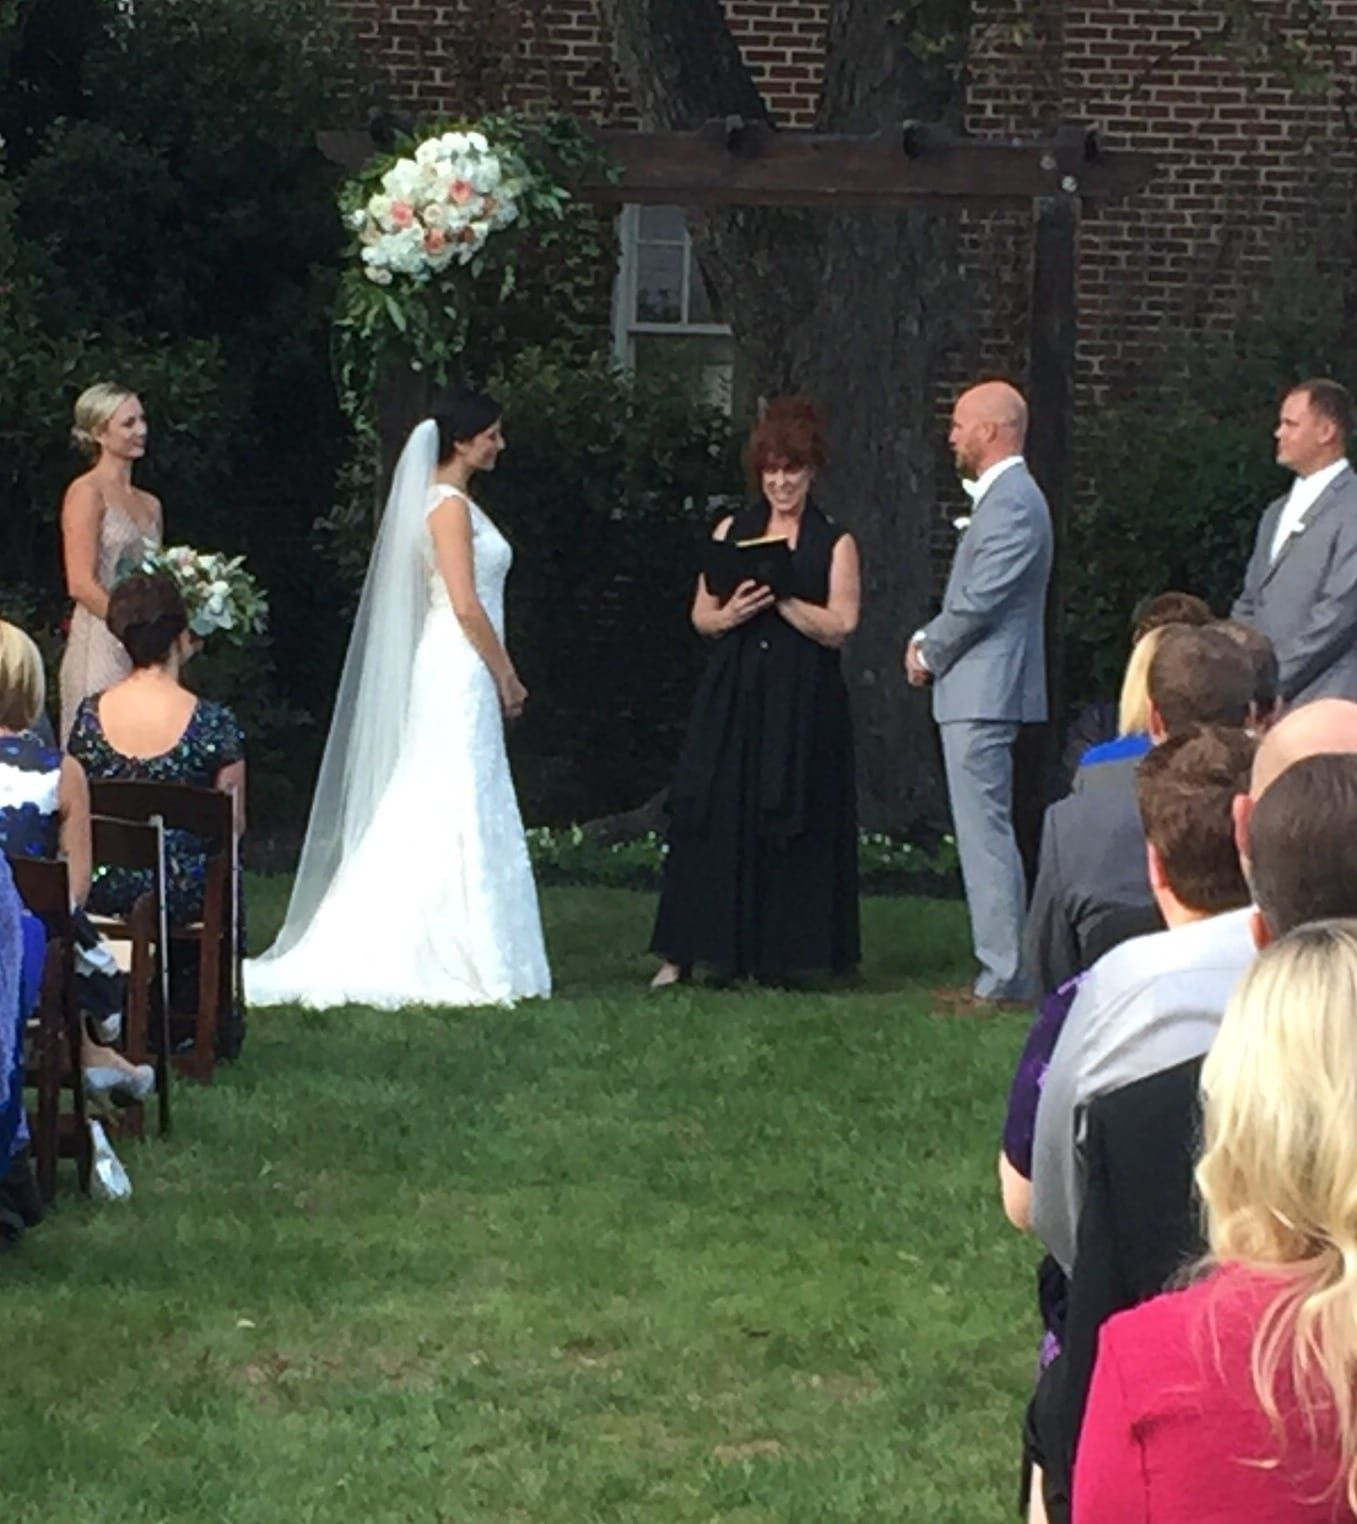 Allaina & Chad's Outdoor Wedding